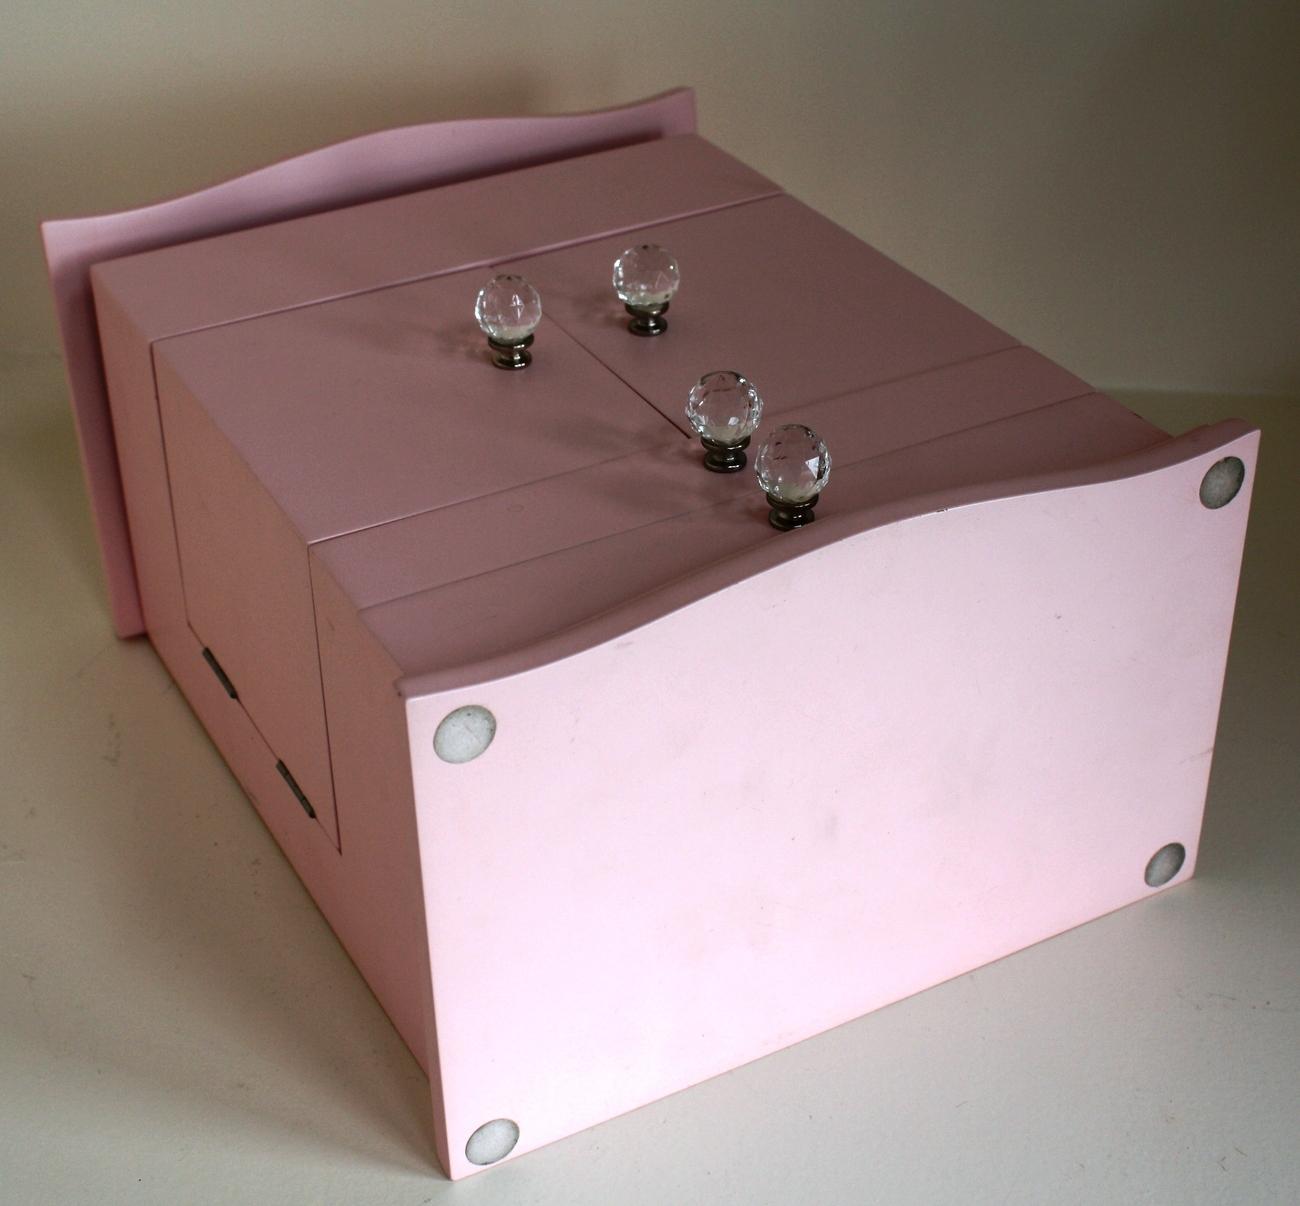 Pottery Barn Kids Teens Jewelry Box Medium Size Pink Wood